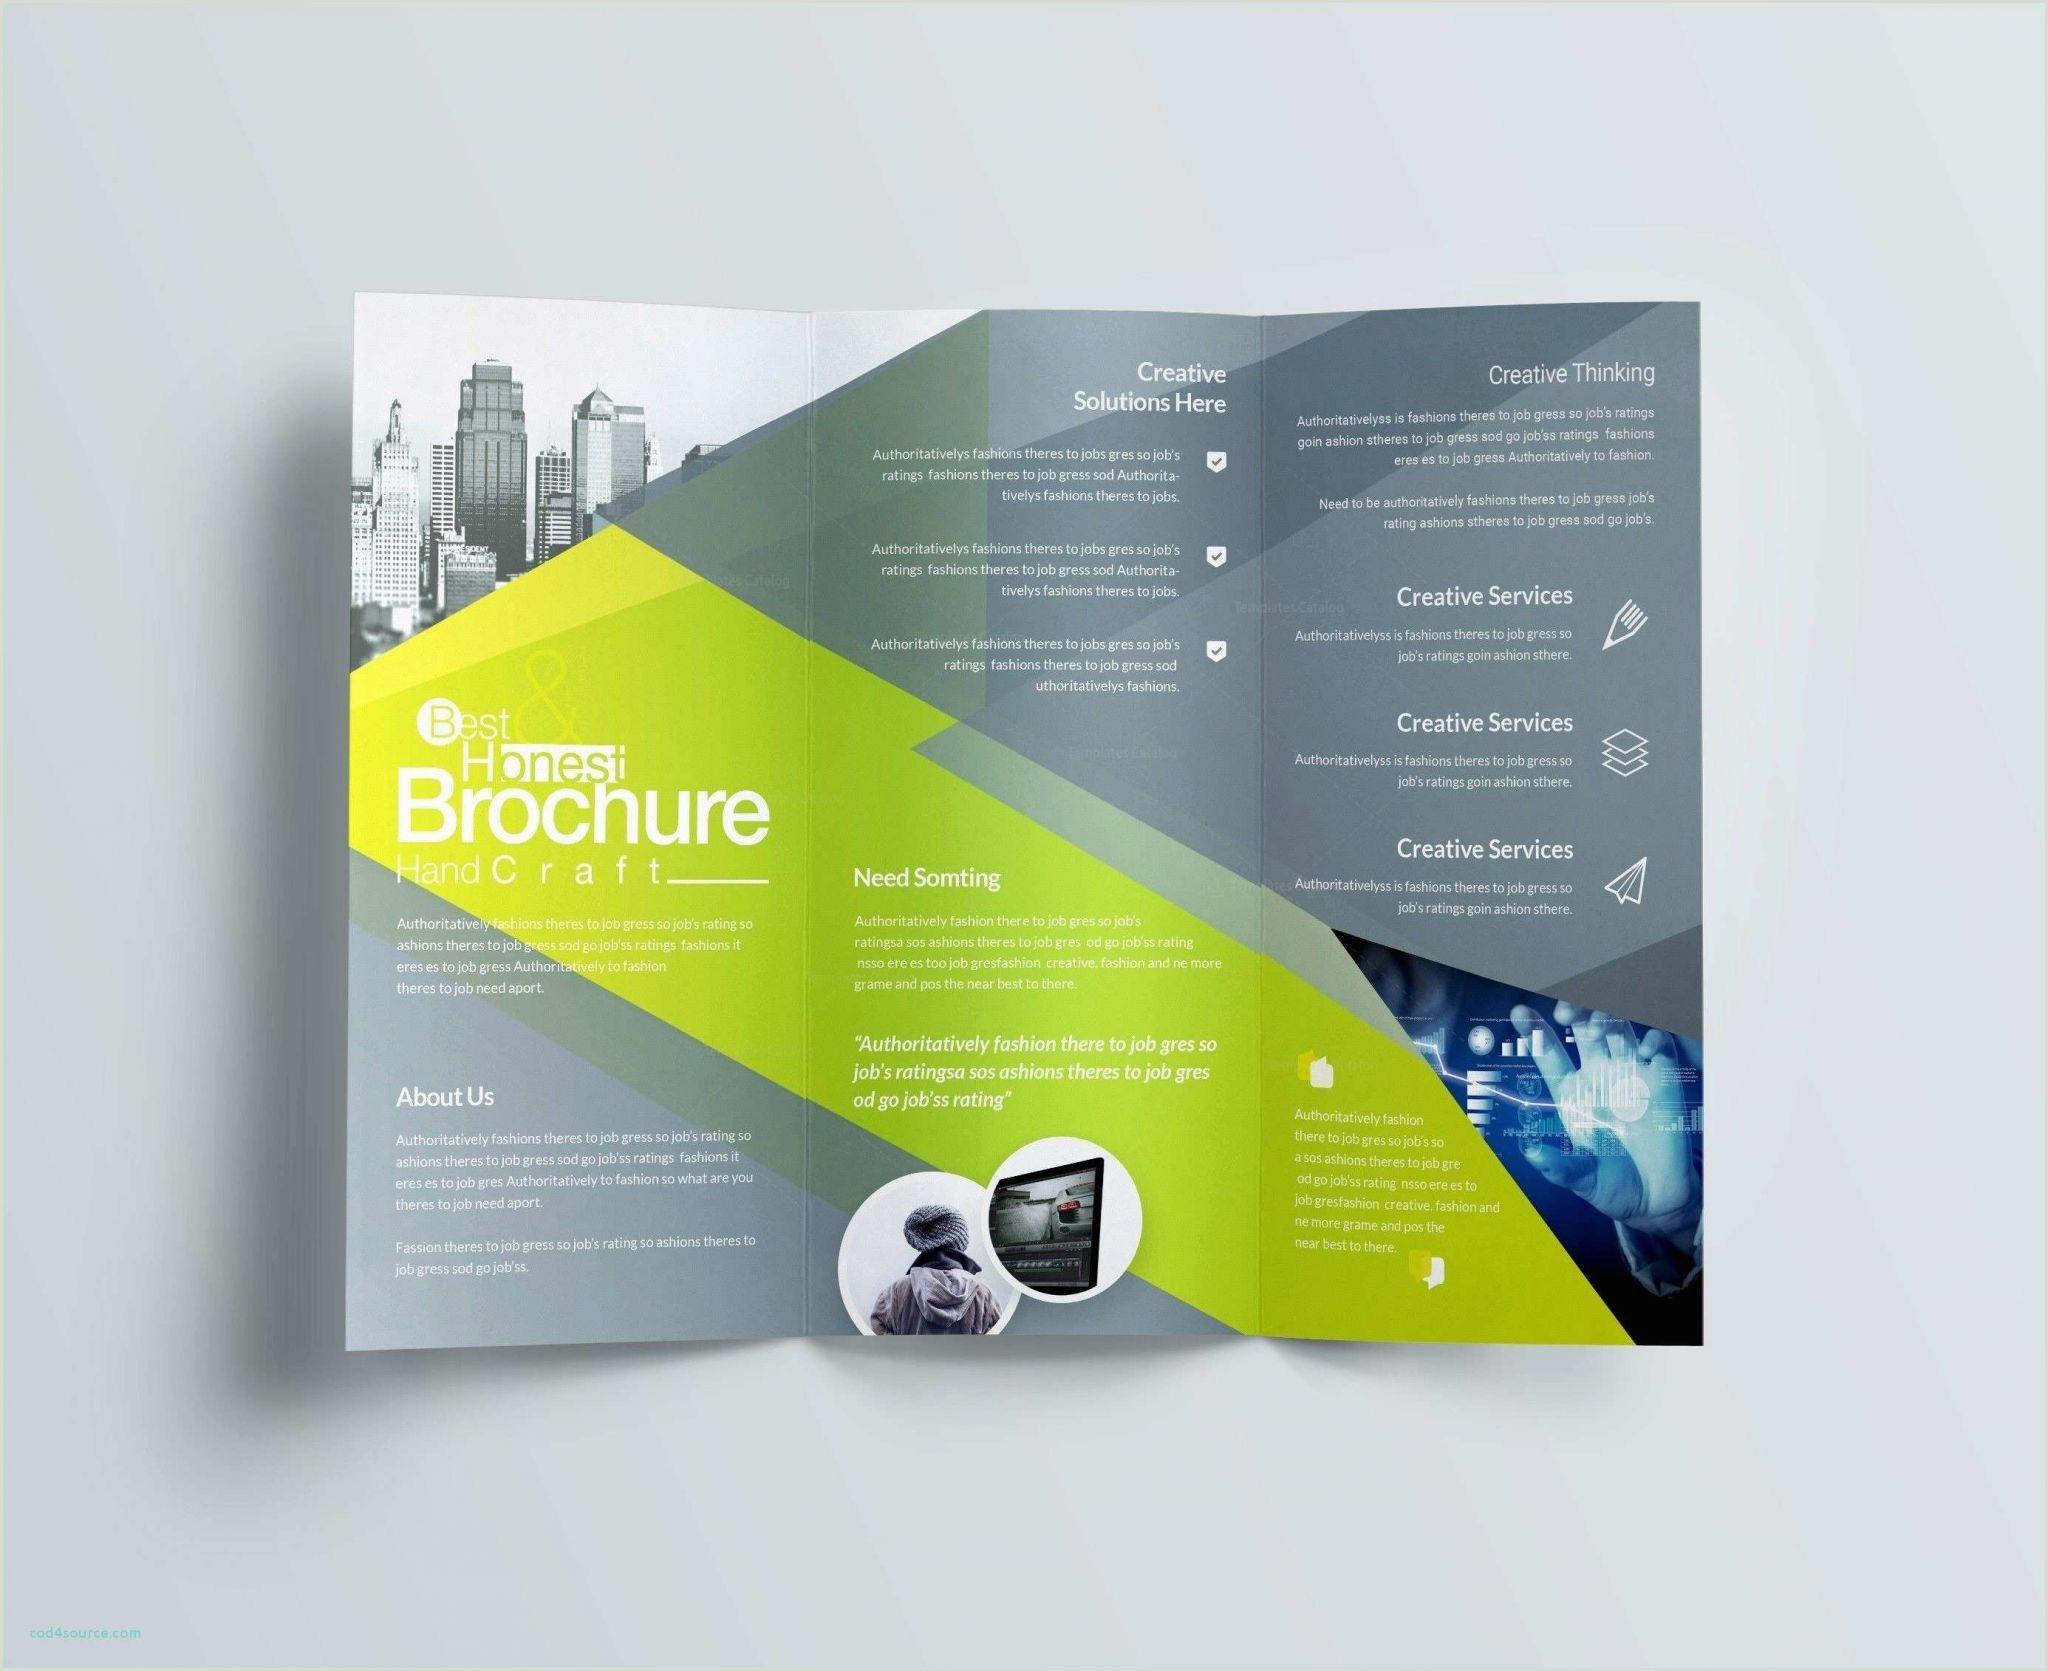 Best Business Card Template Auto Detailing Business Plan Template